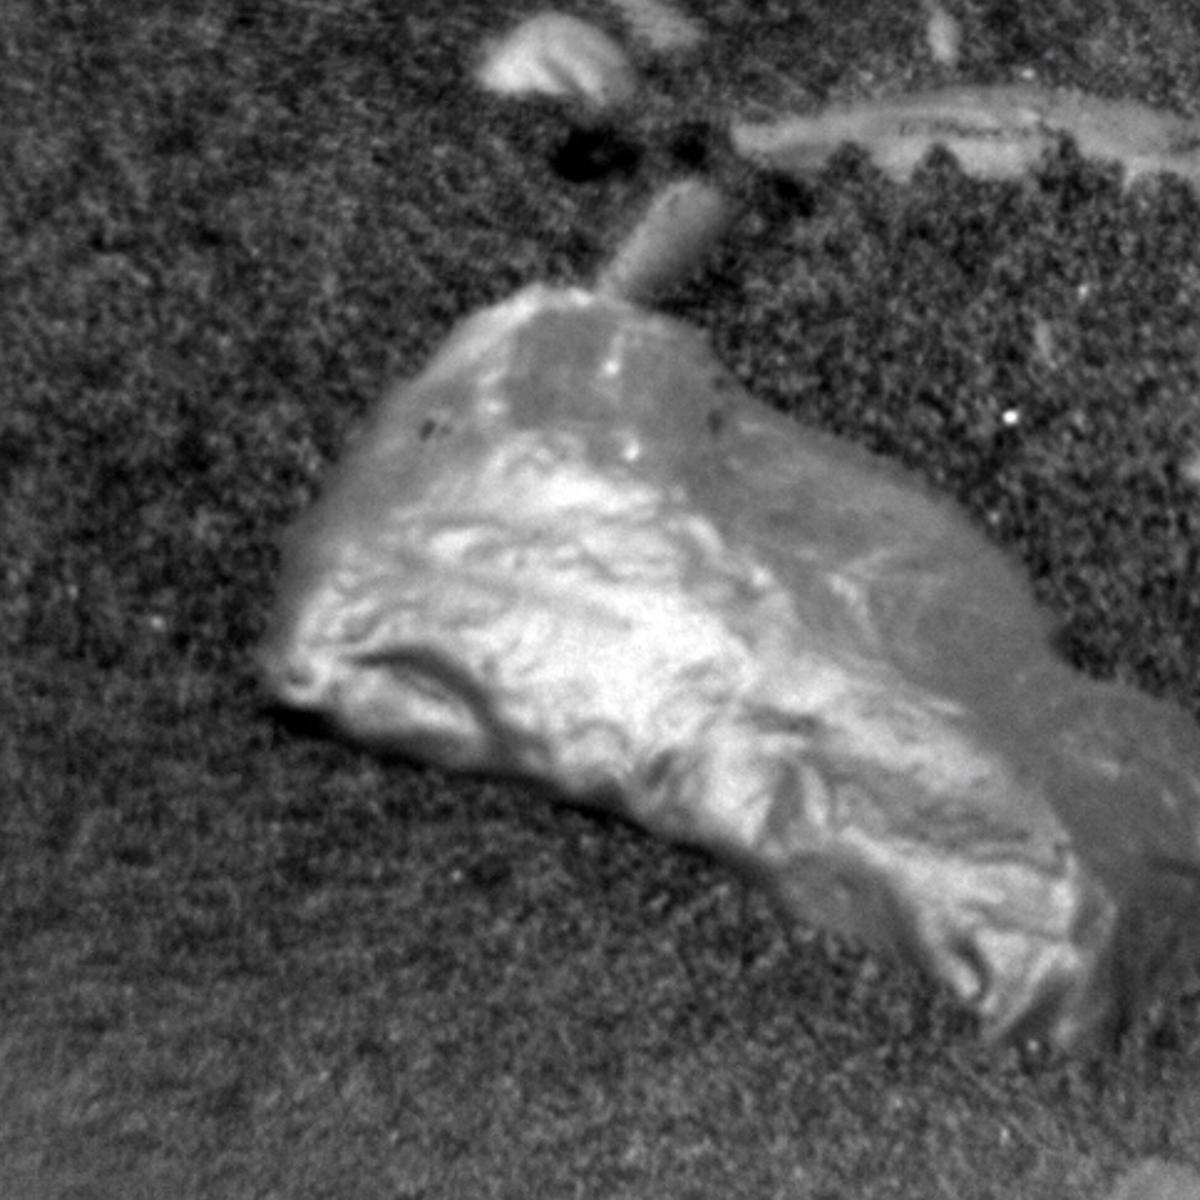 shiny rock found on Mars by Curiosity